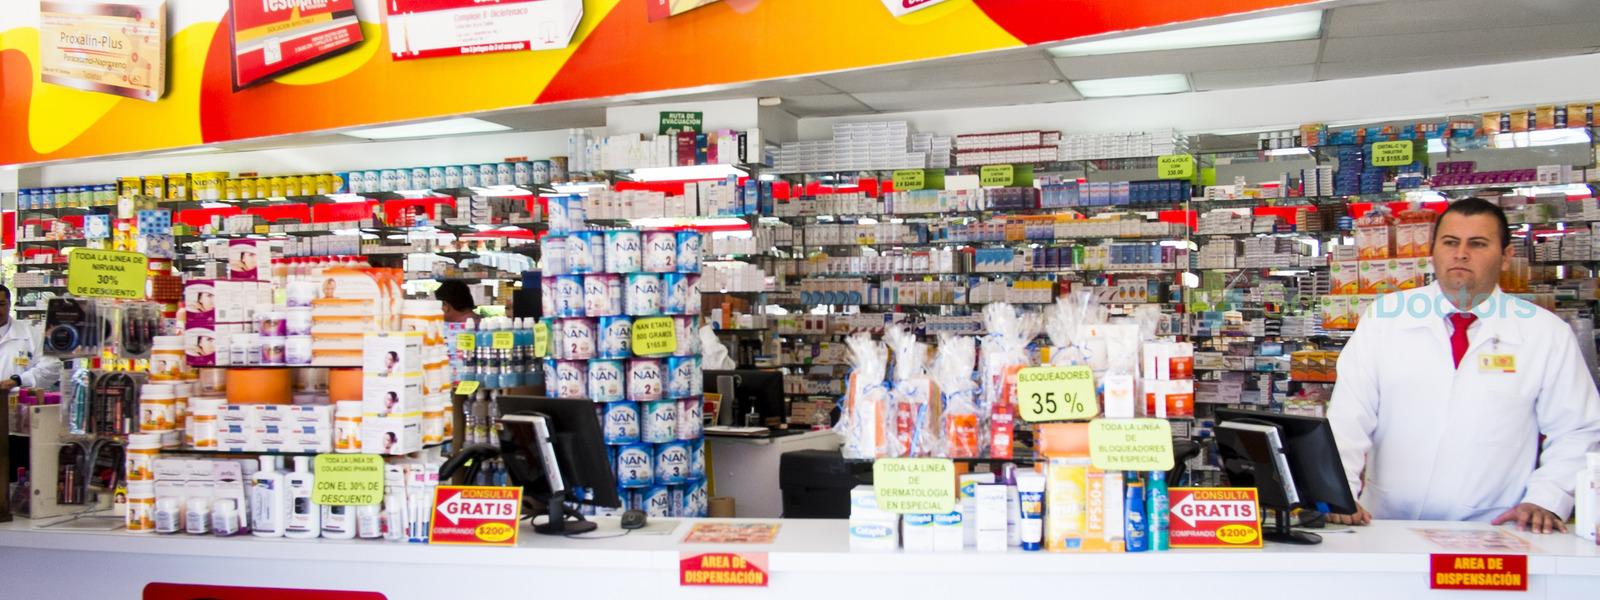 Farmacia la mas barata mexicali telefono